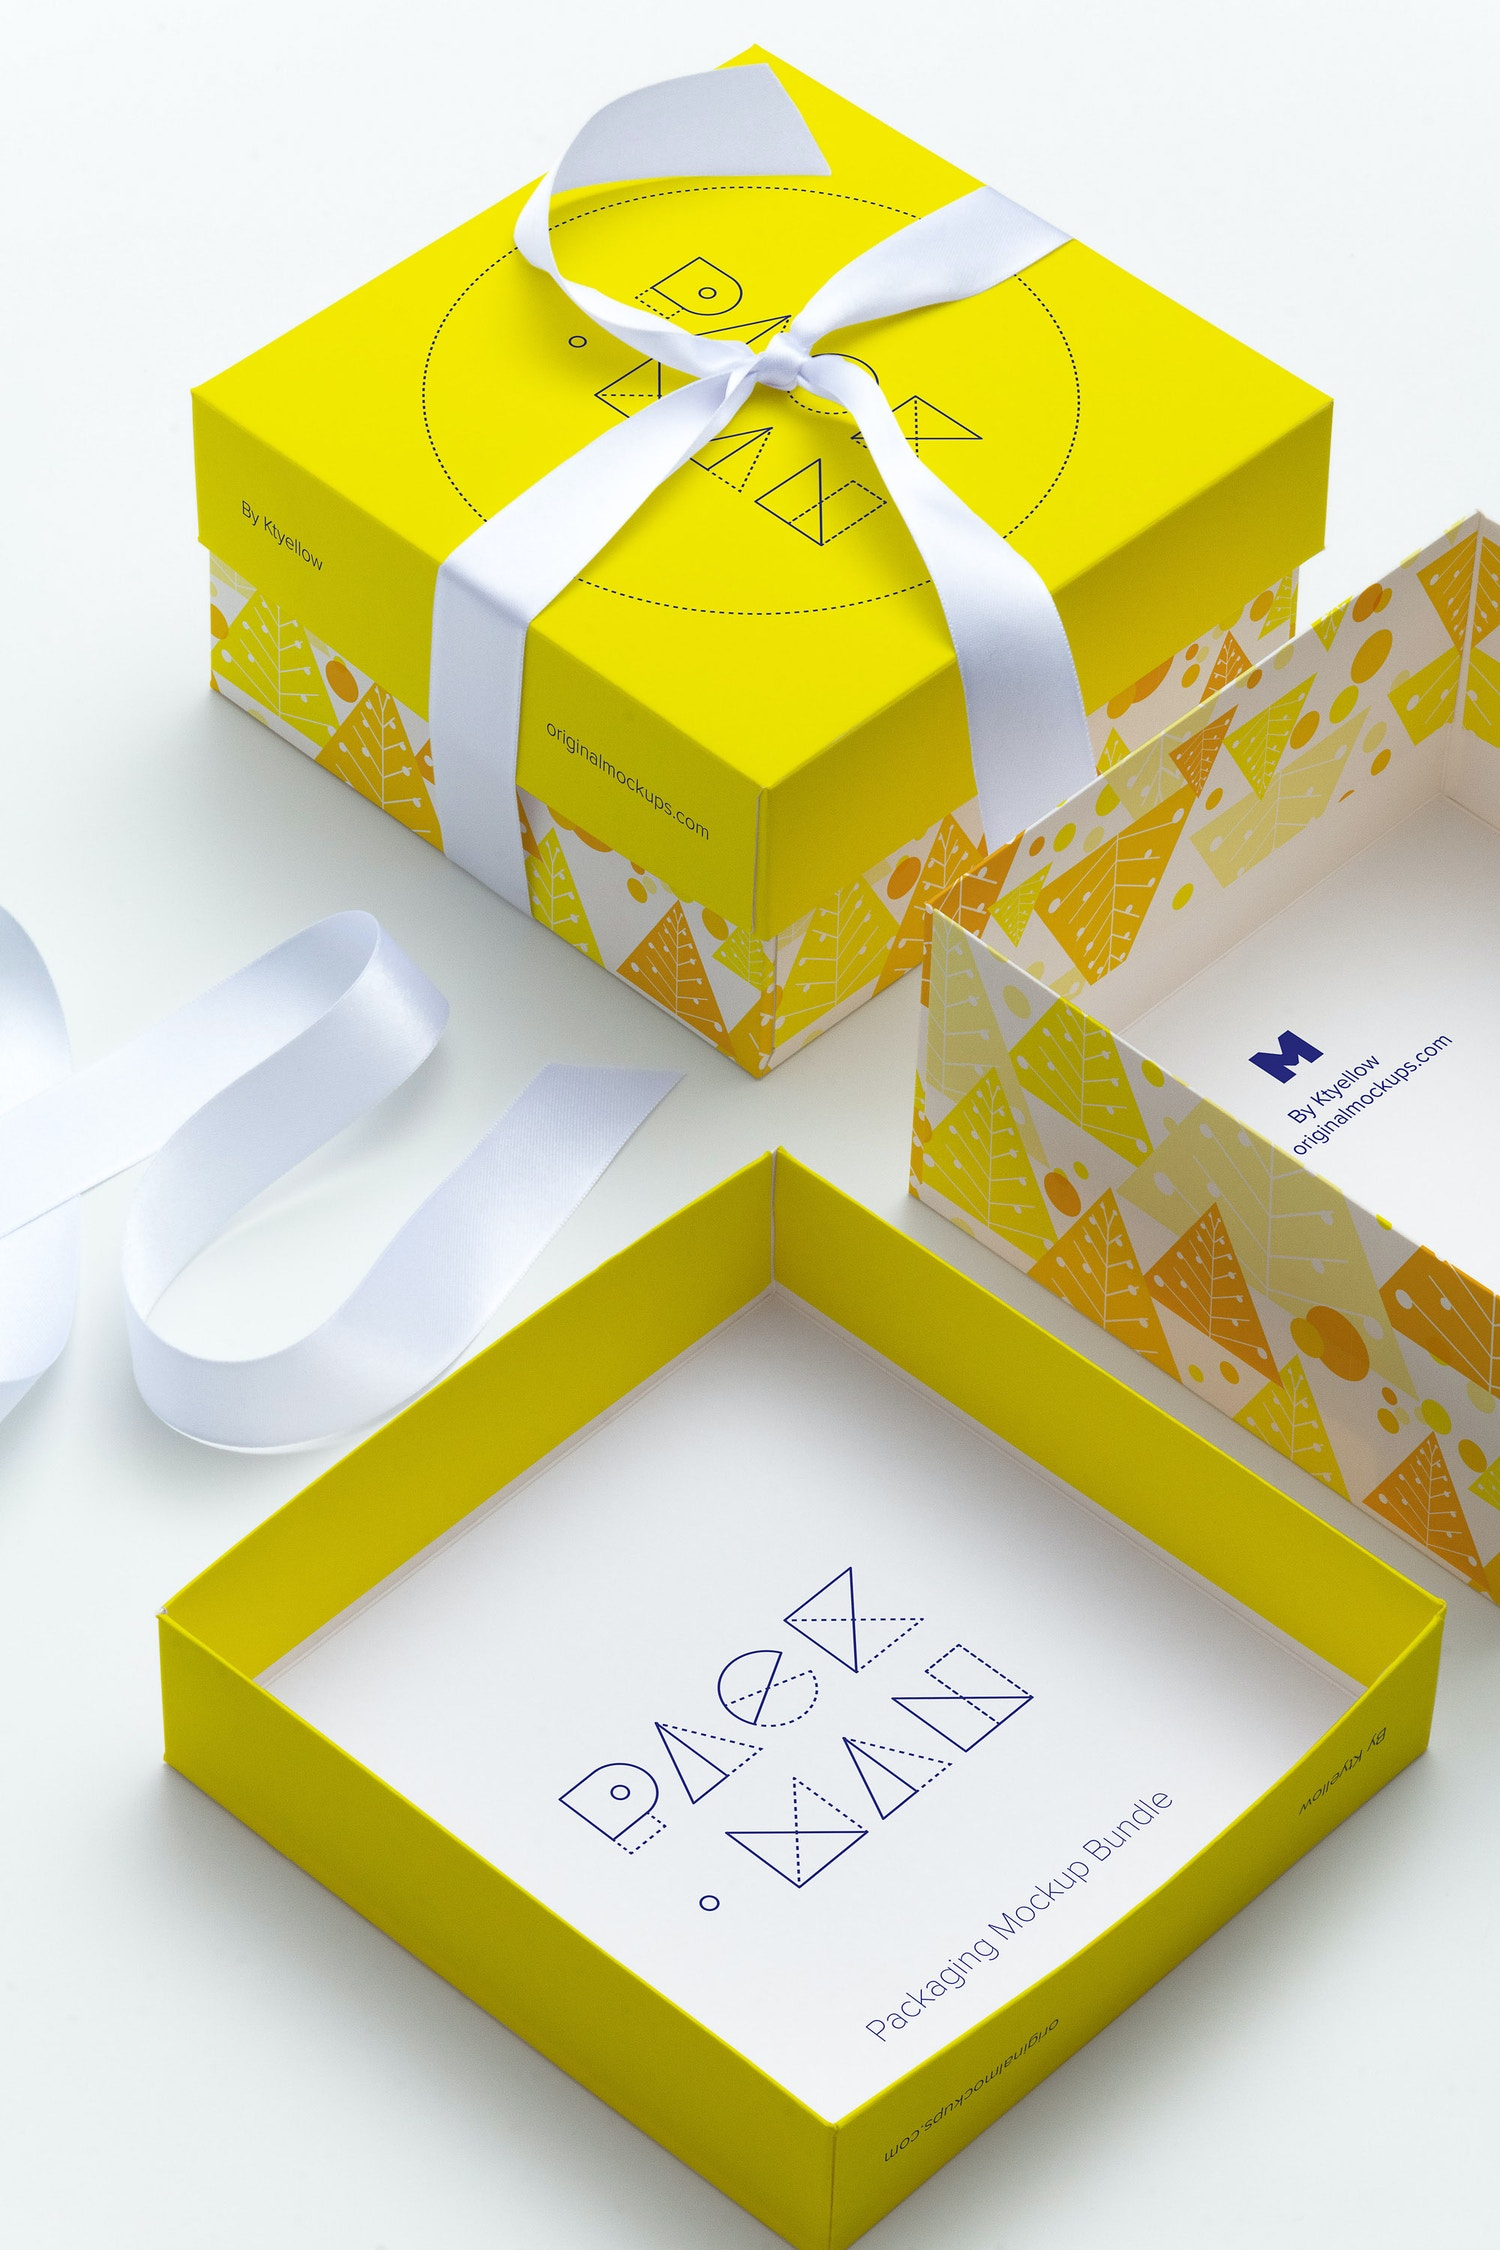 Big Gift Box Mockup 02 by Ktyellow  on Original Mockups